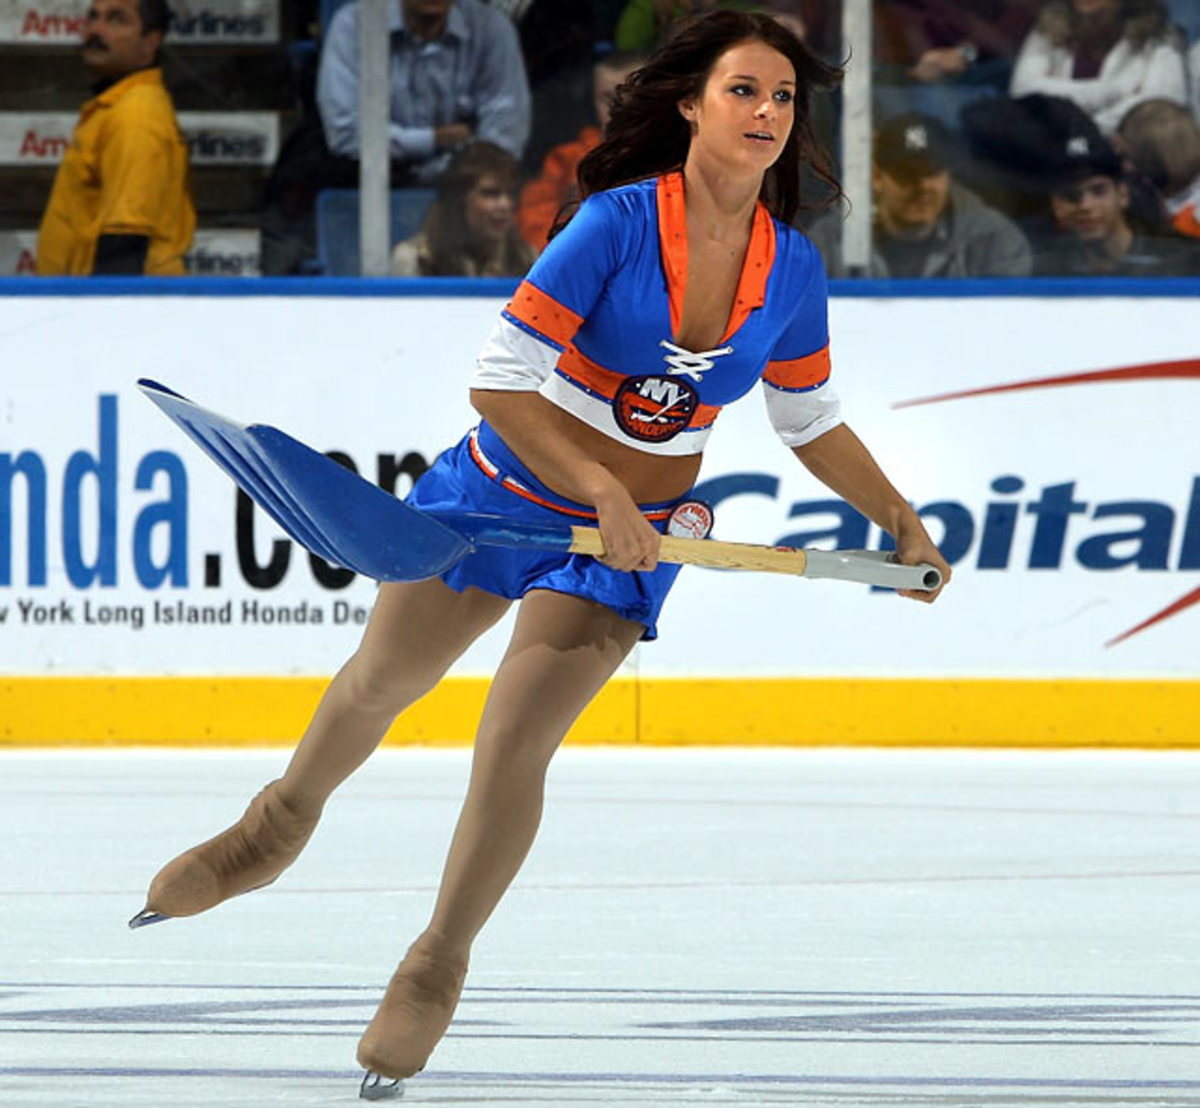 islanders-ice-girl%2807%29.jpg